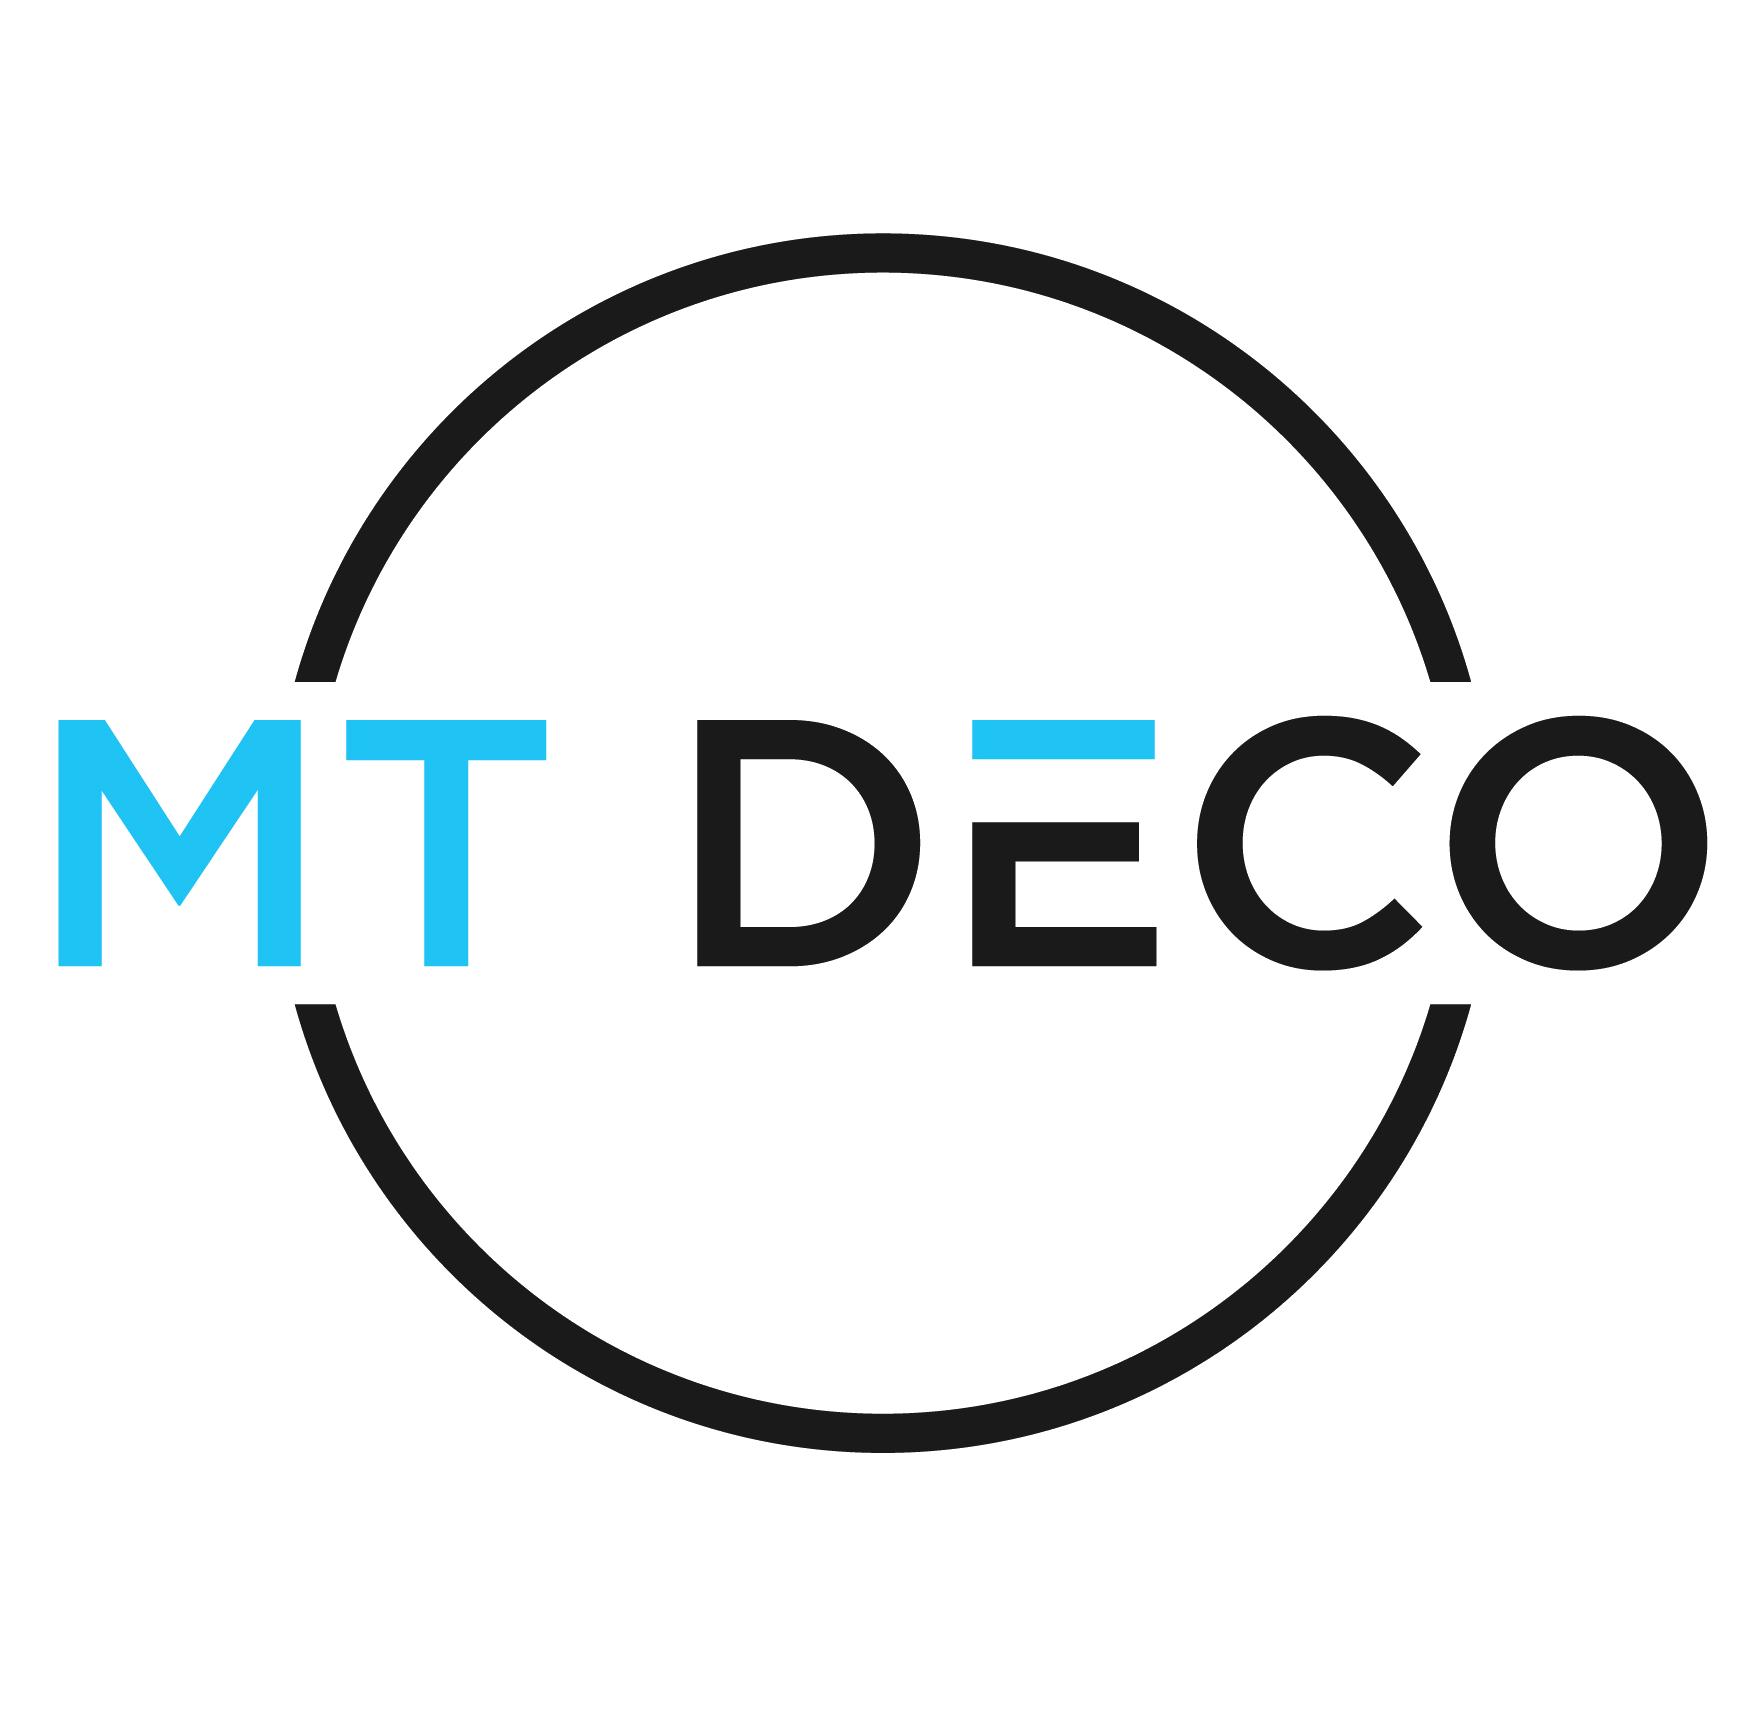 MT Deco